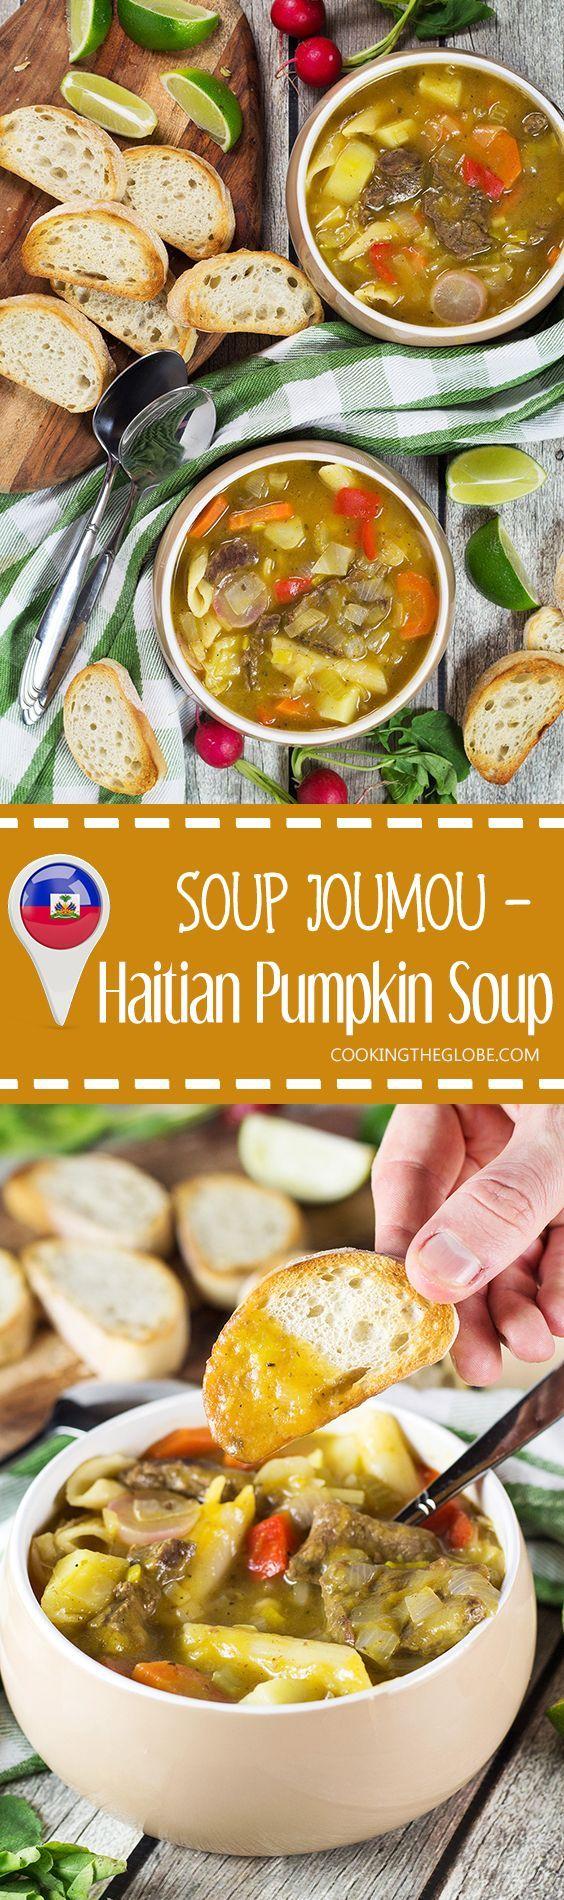 soup joumou  haitian new year's soup  recipe  haitian